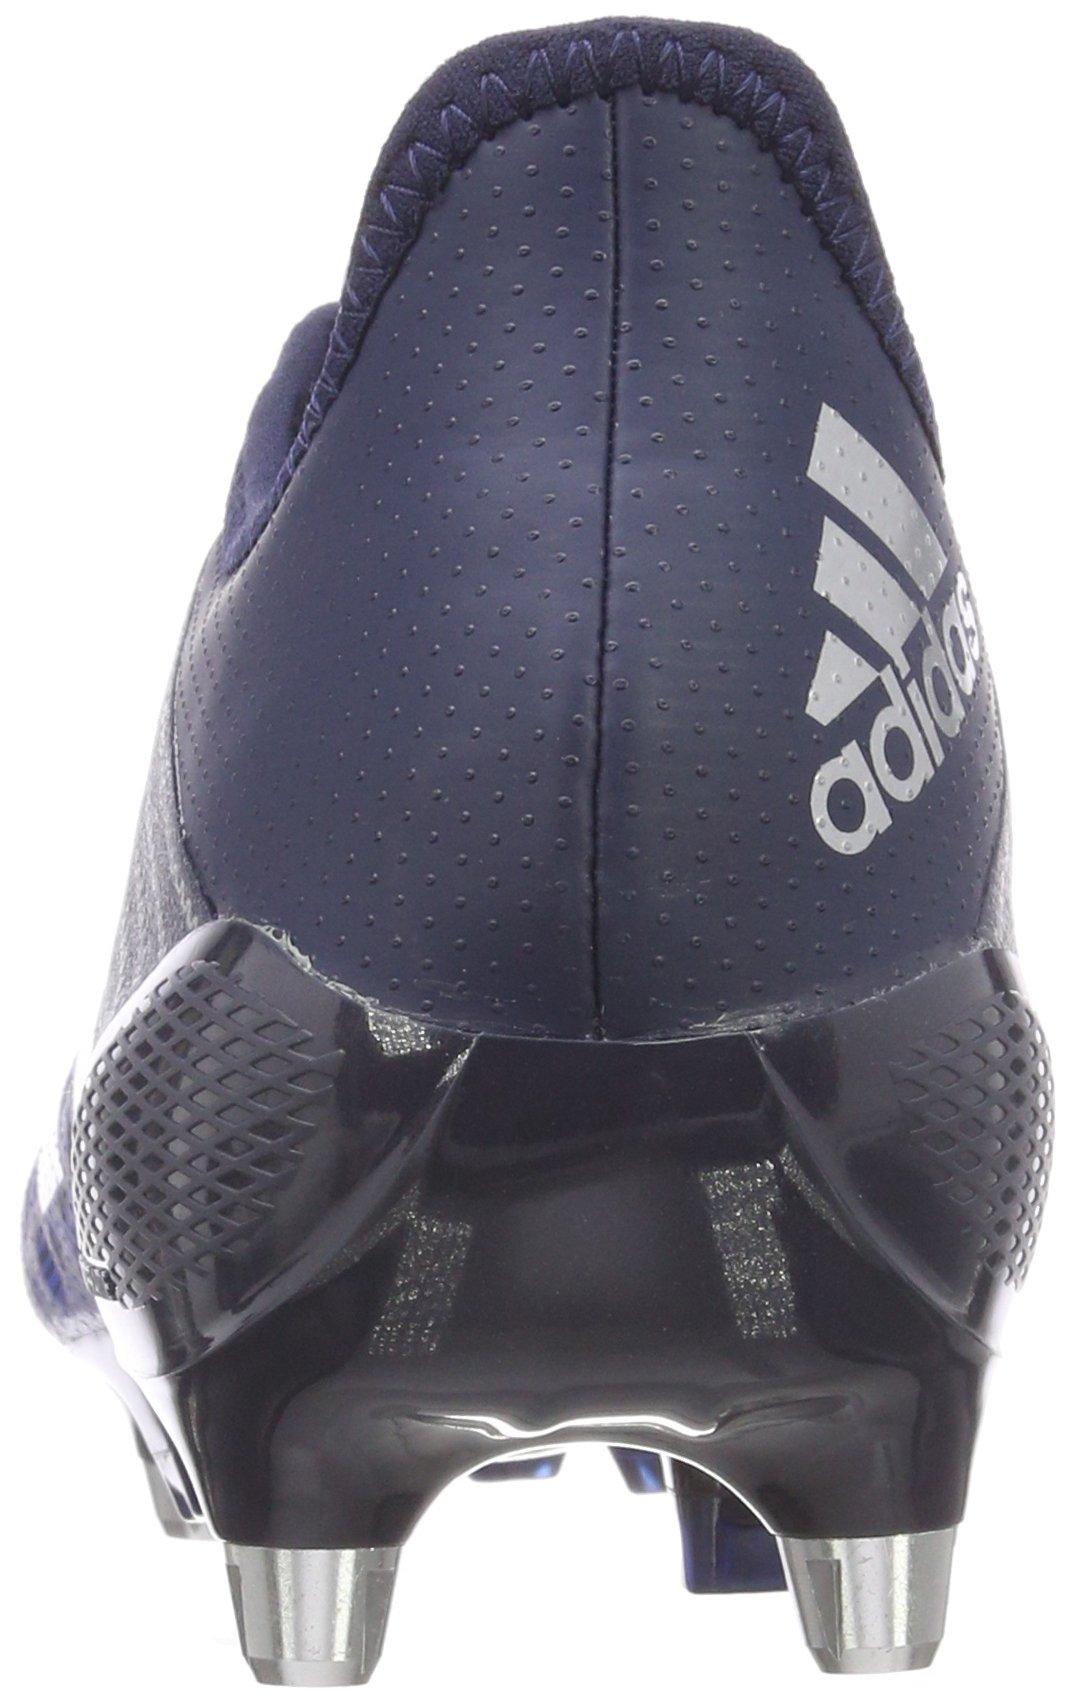 adidas Predator Malice Control (SG), Scarpe da Football Americano Uomo 2 spesavip